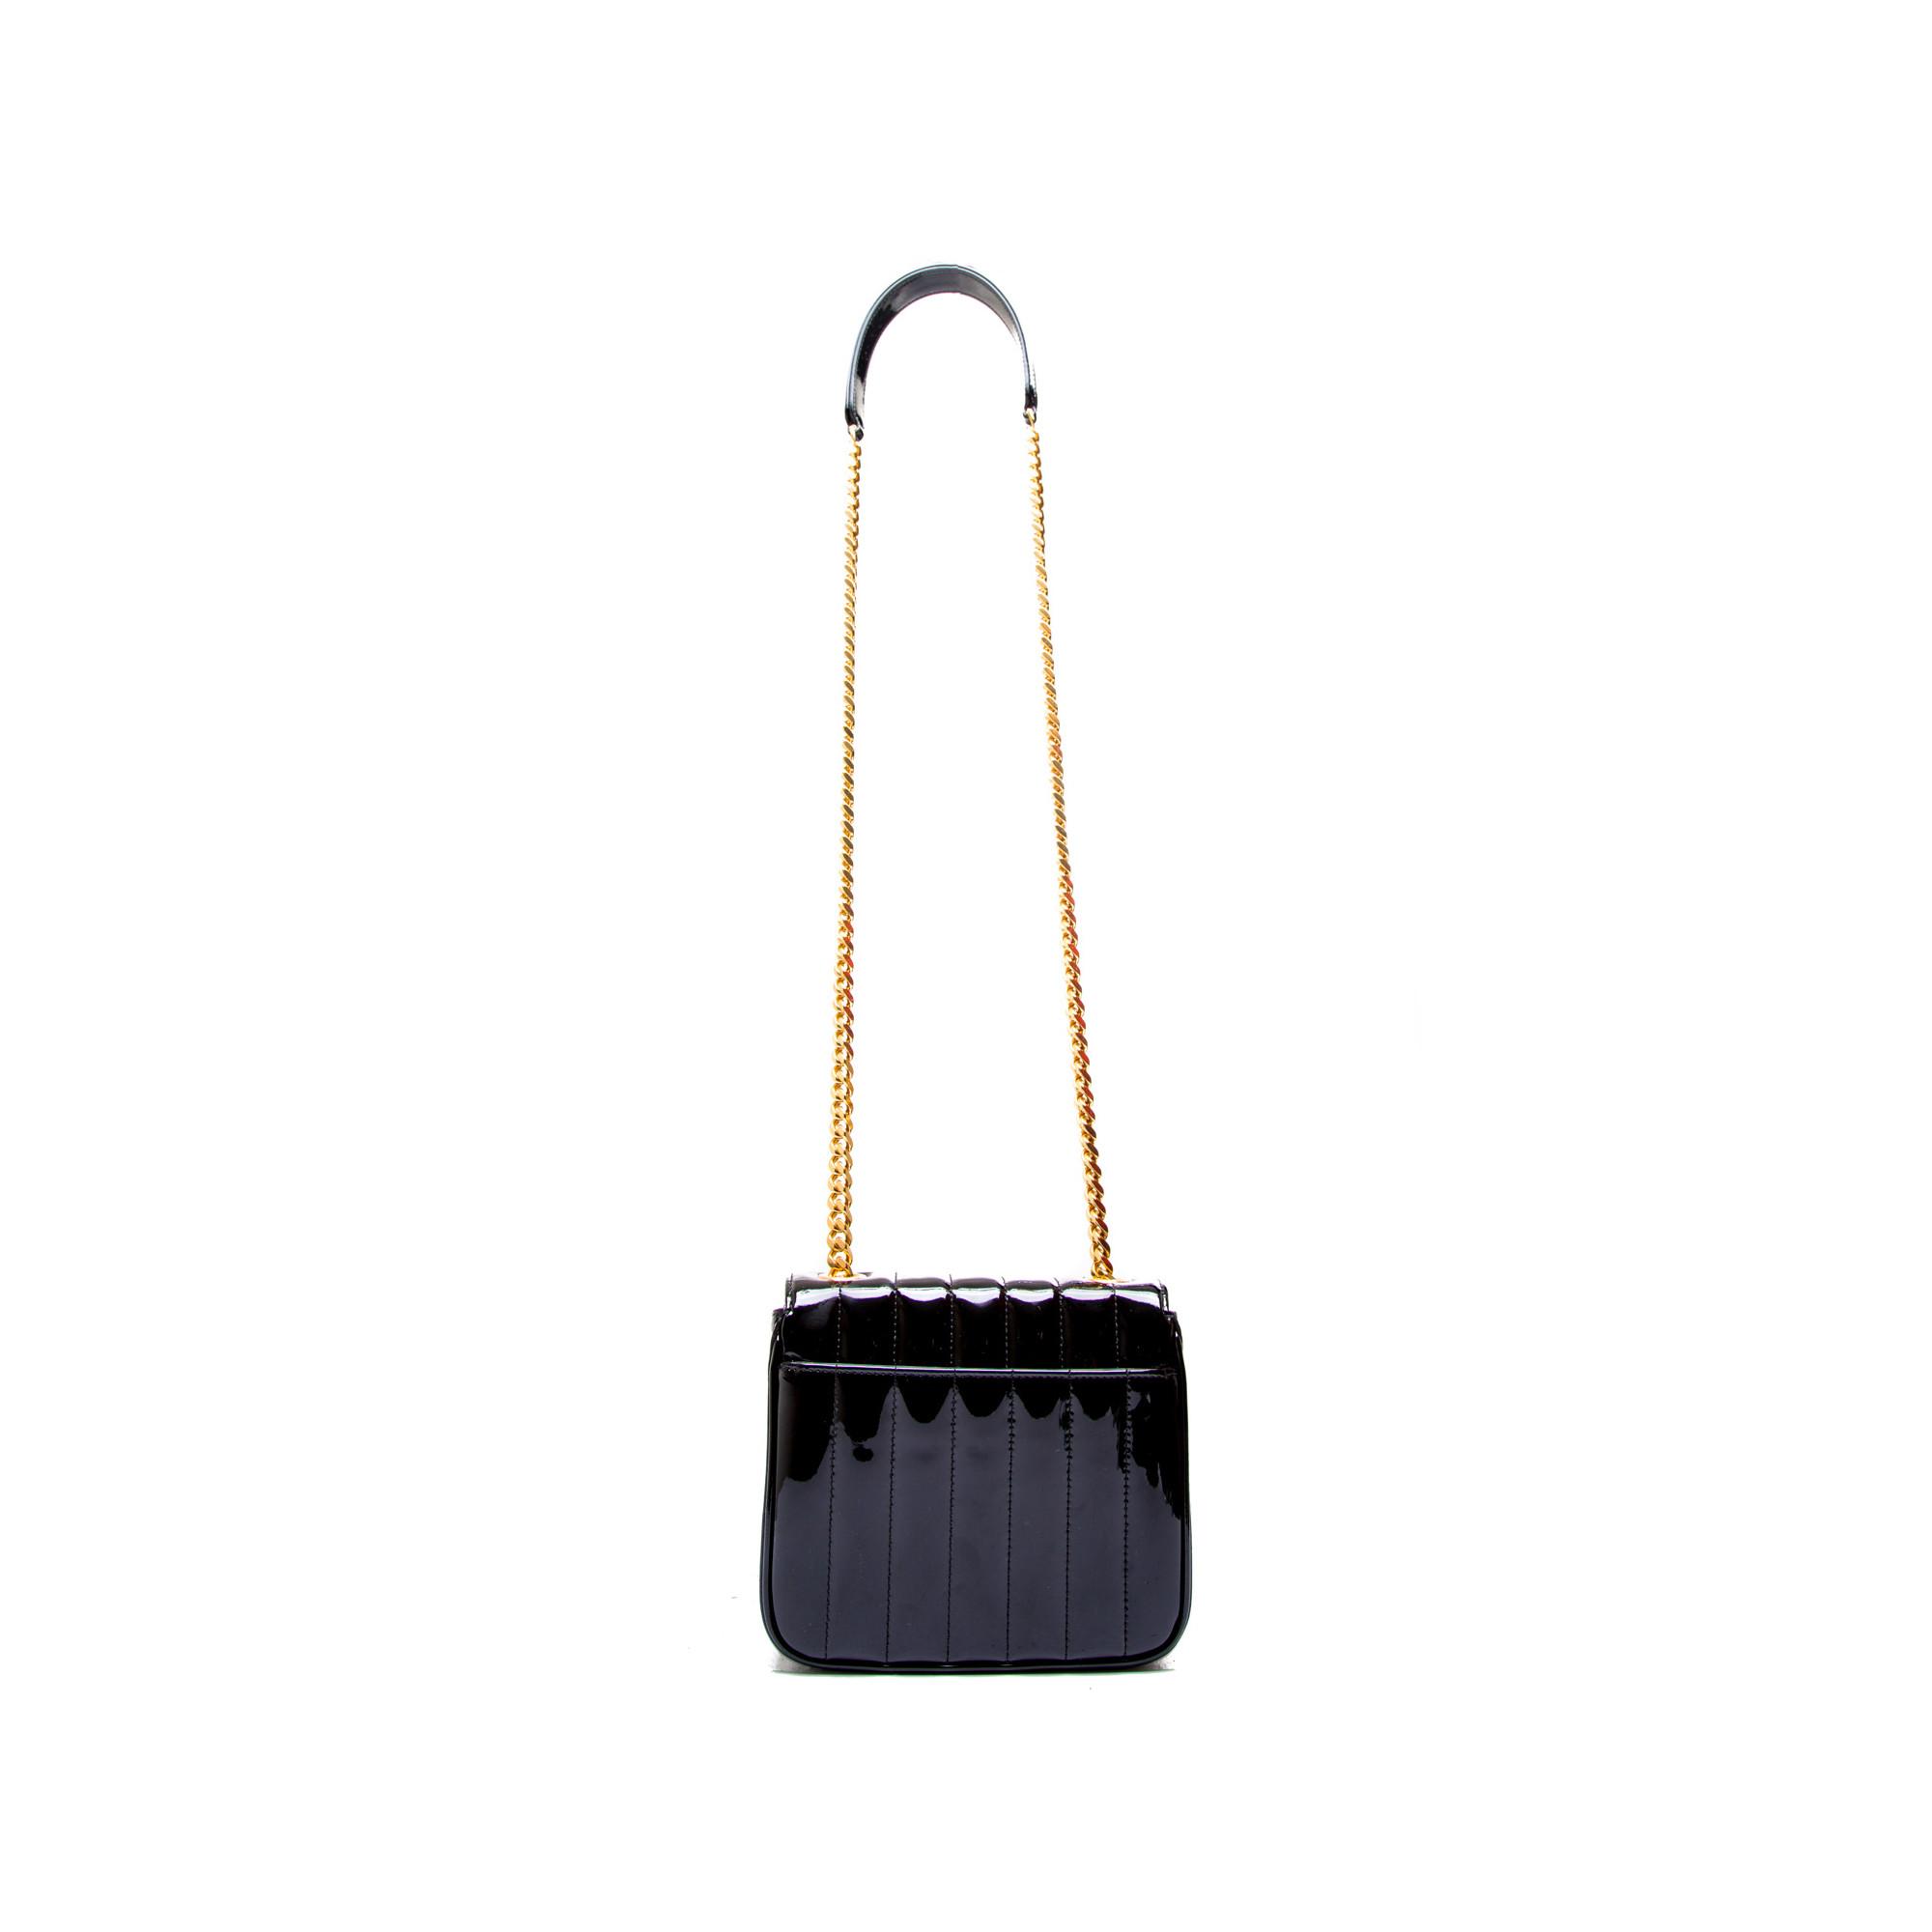 ... Saint Laurent ysl bag mng vicky s black Saint Laurent ysl bag mng vicky  s black ... 033688a1db942